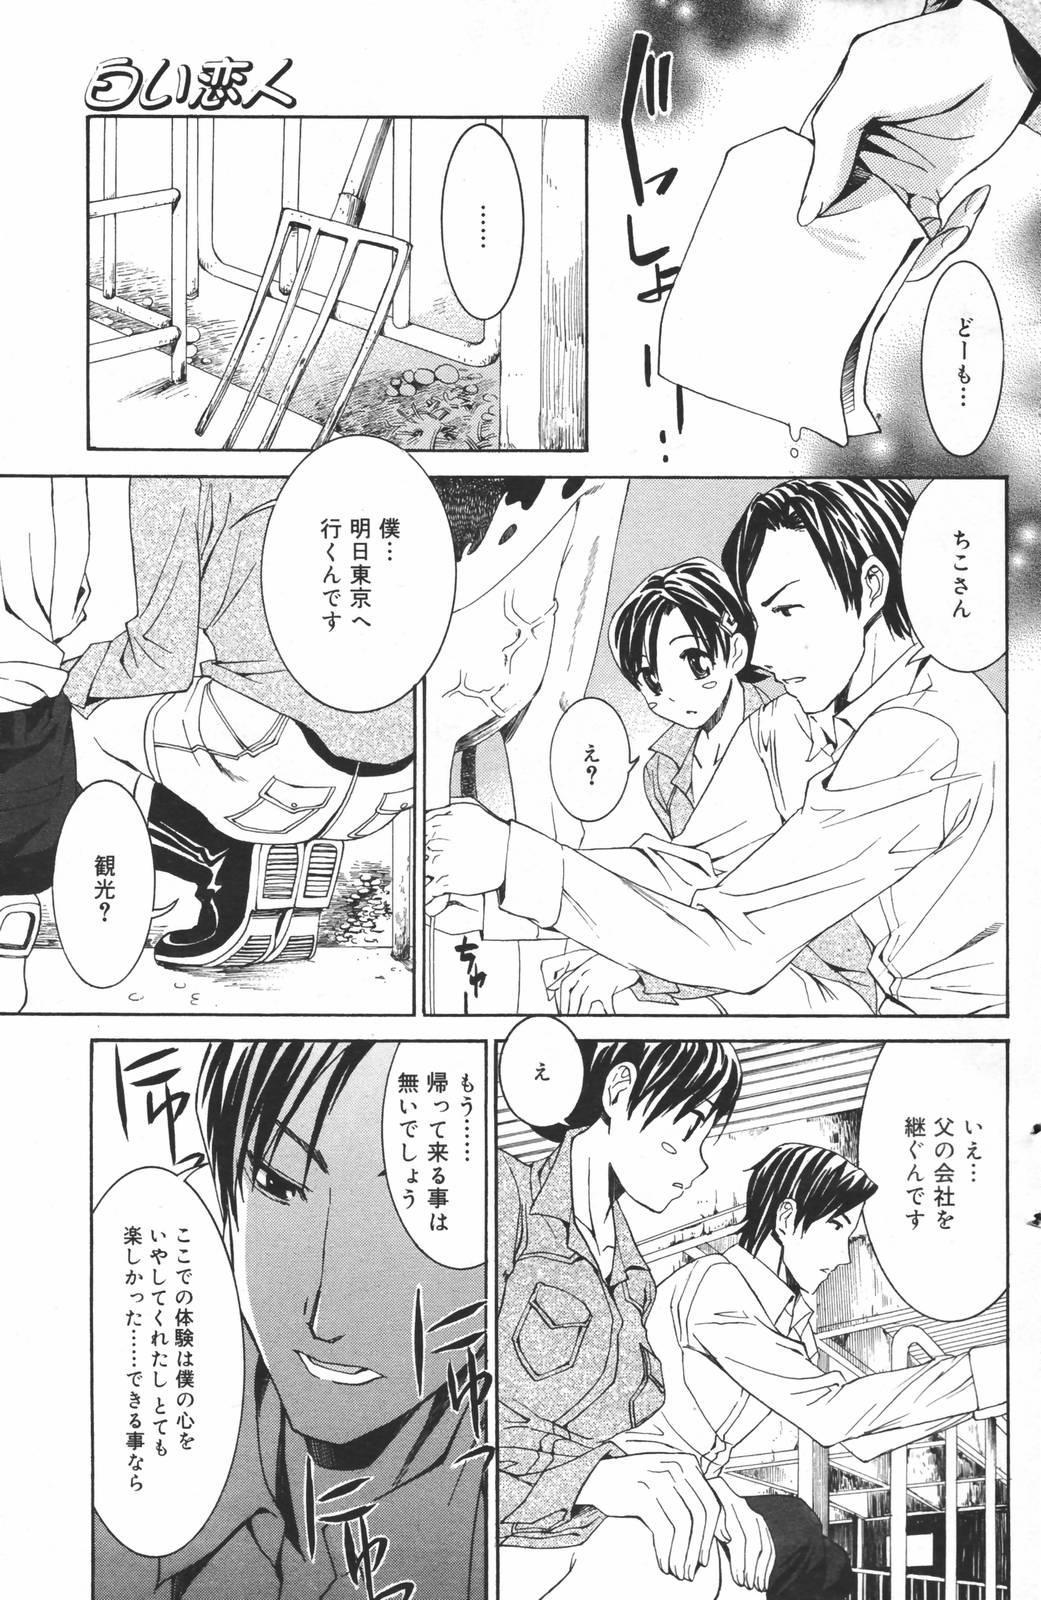 Manga Bangaichi 2007-03 132